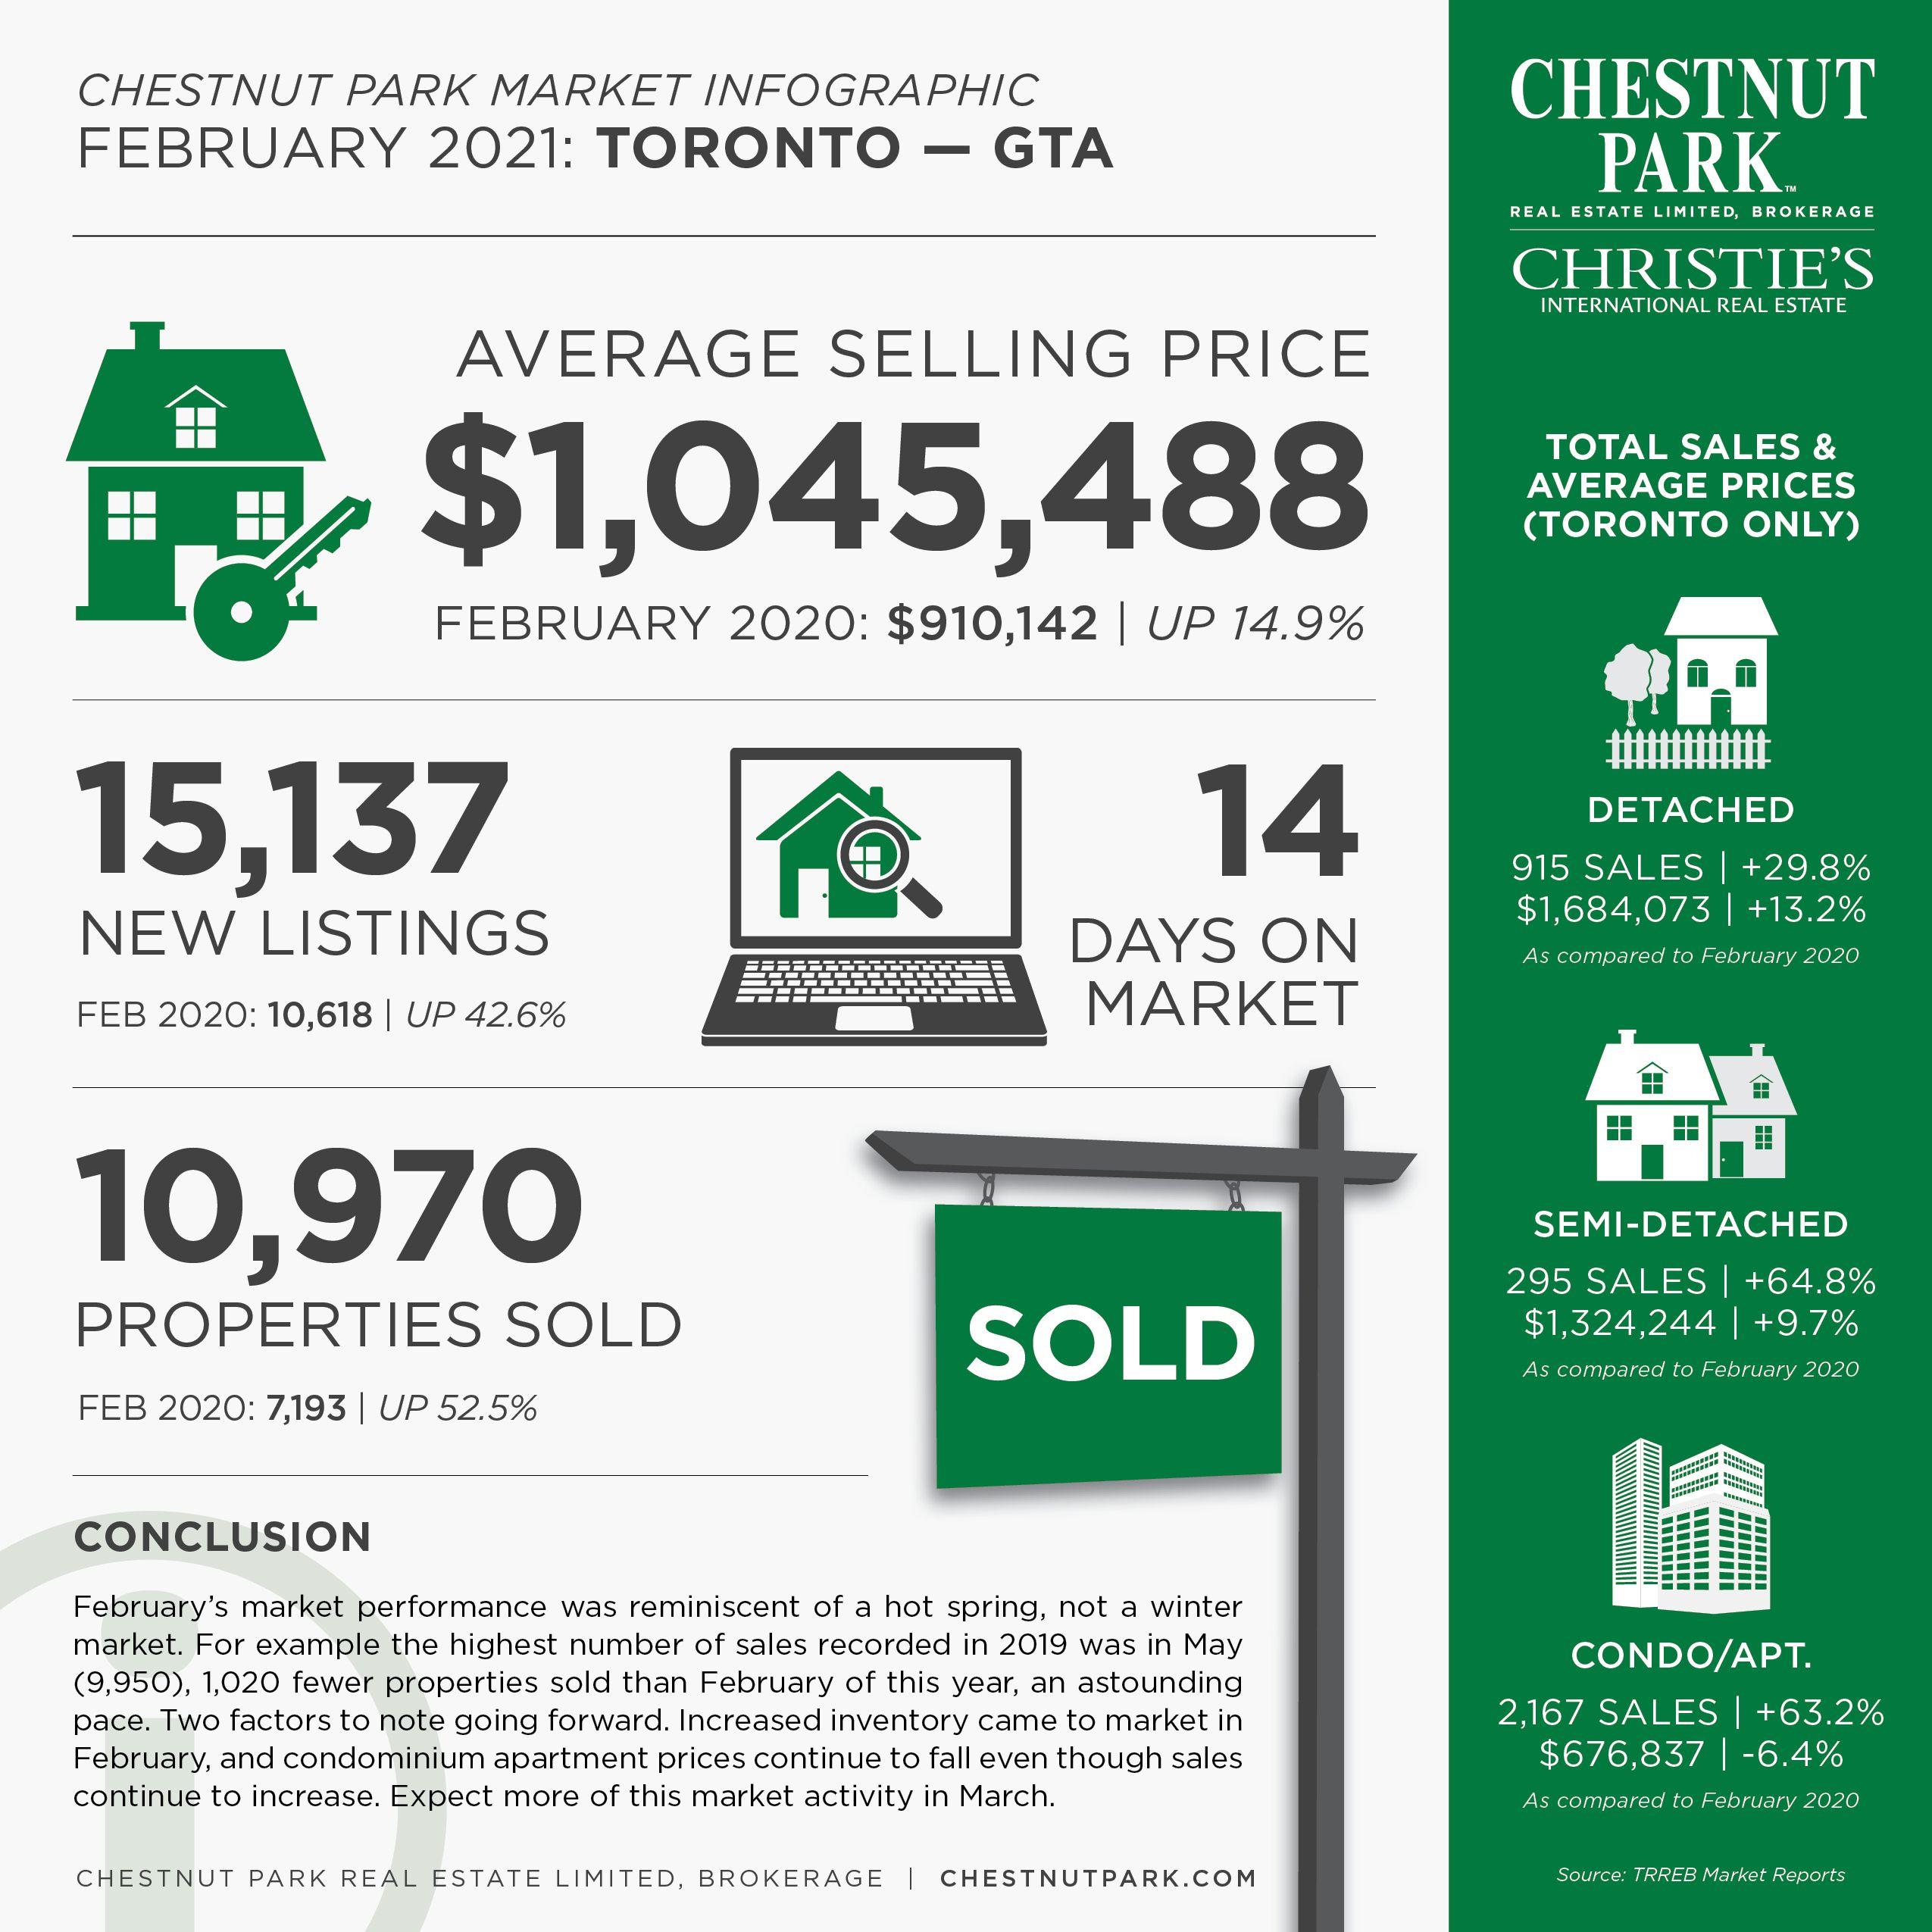 Toronto_MarketInfographic_Feb2021 (1).jpg